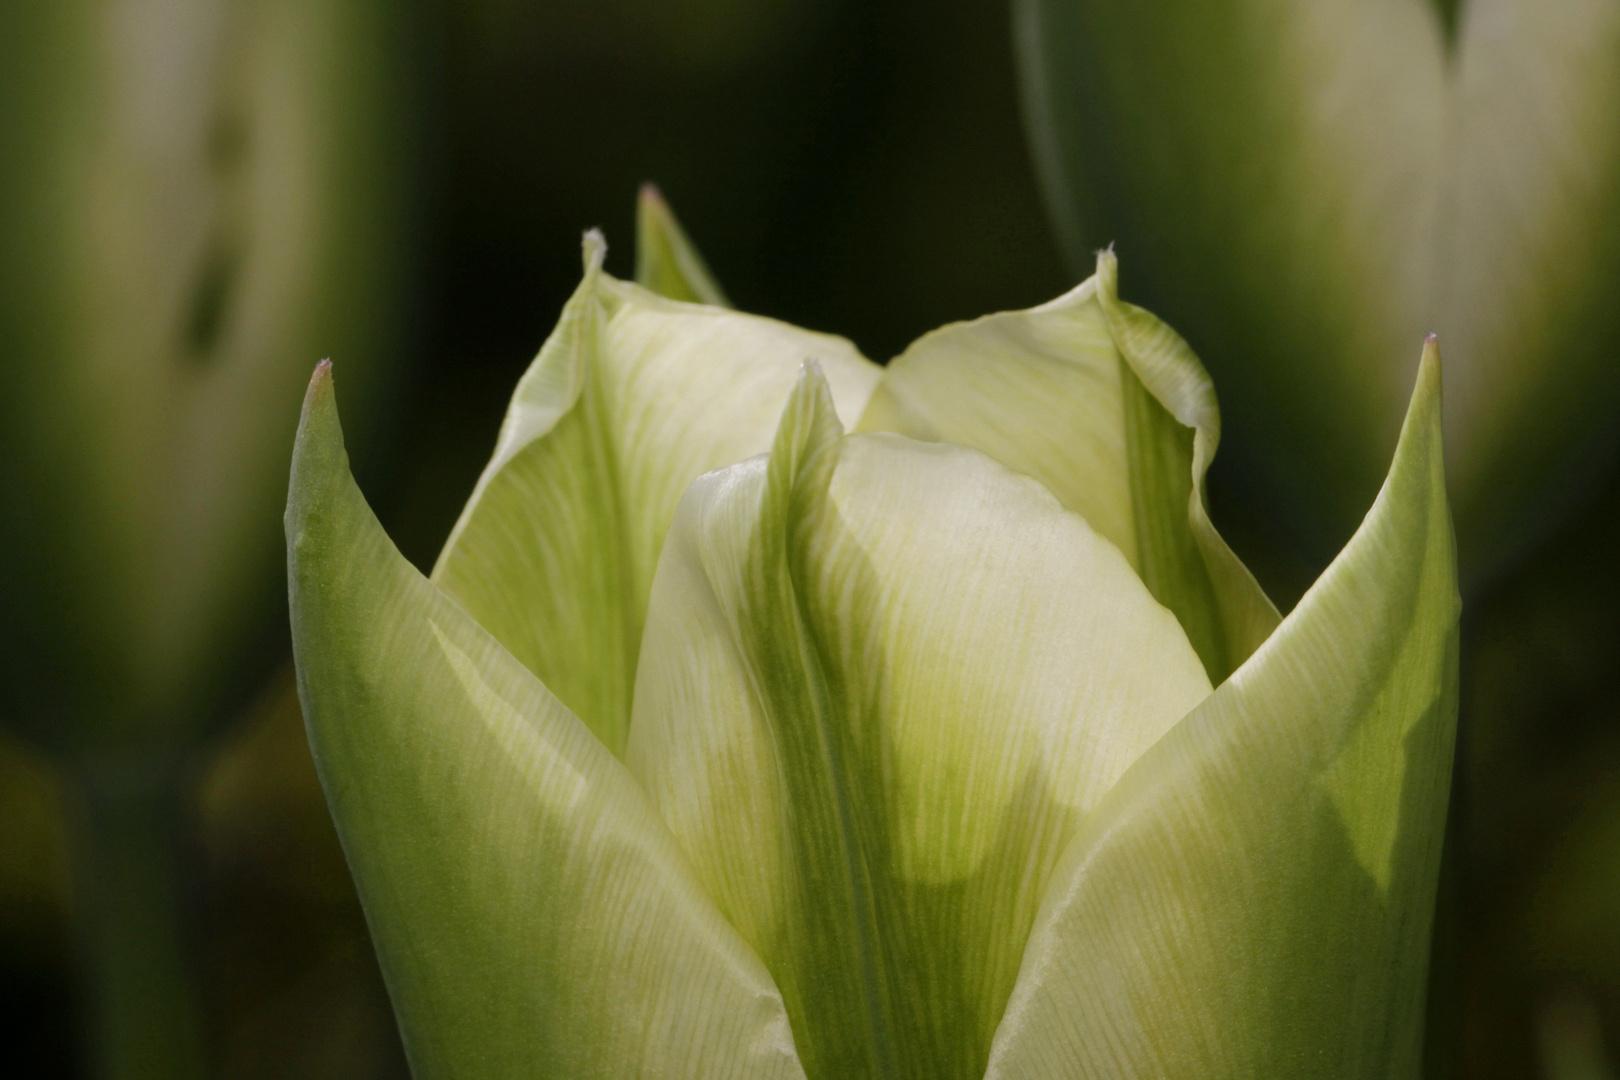 weiß-grüne tulpe